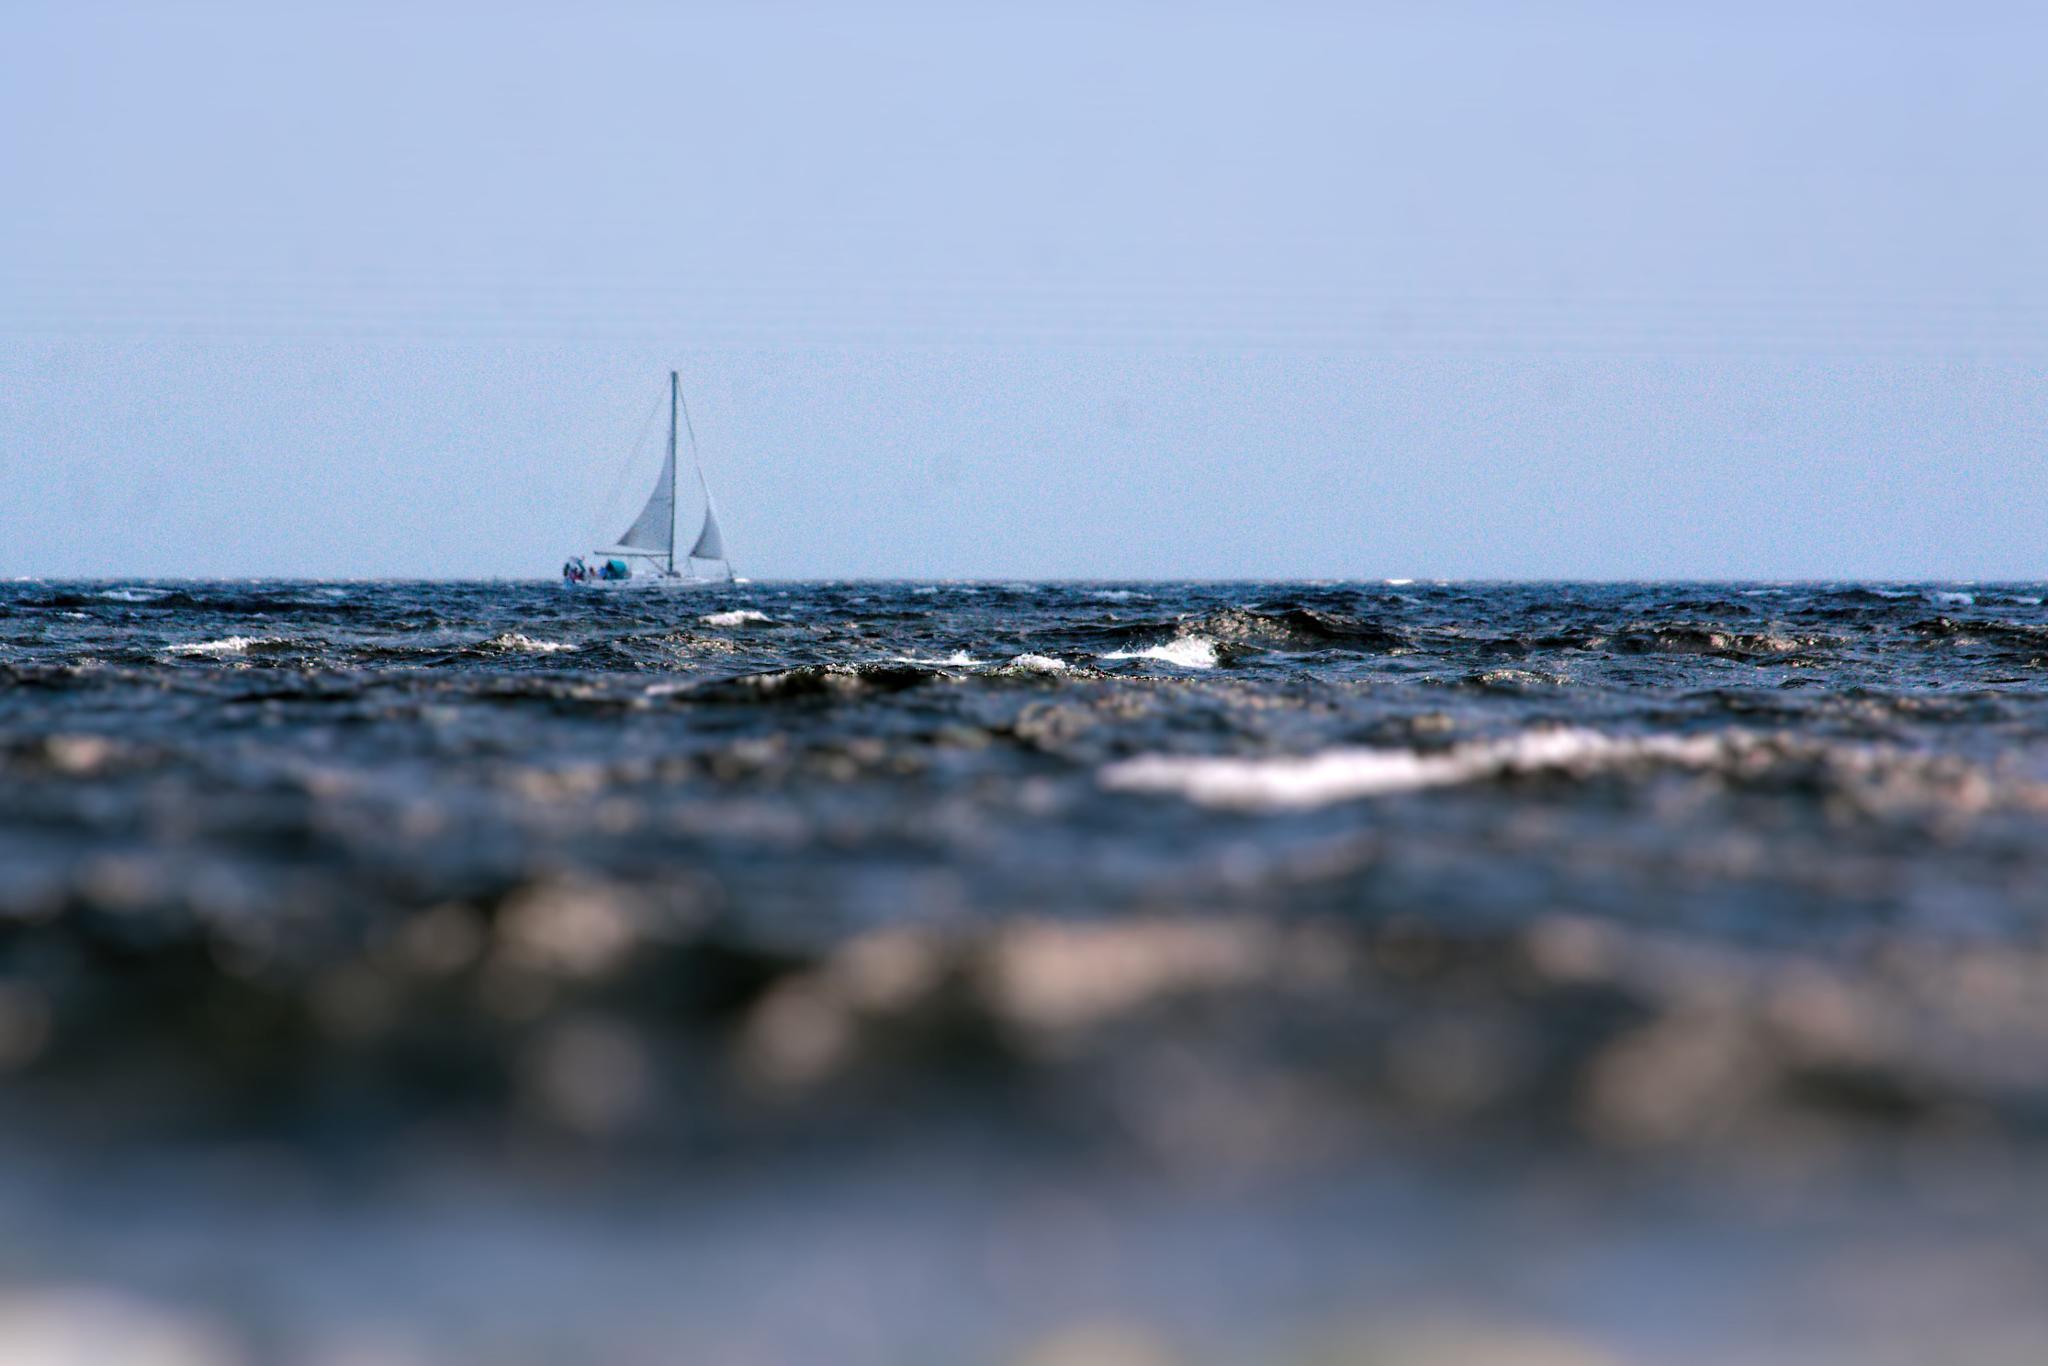 Sail by ochemodan